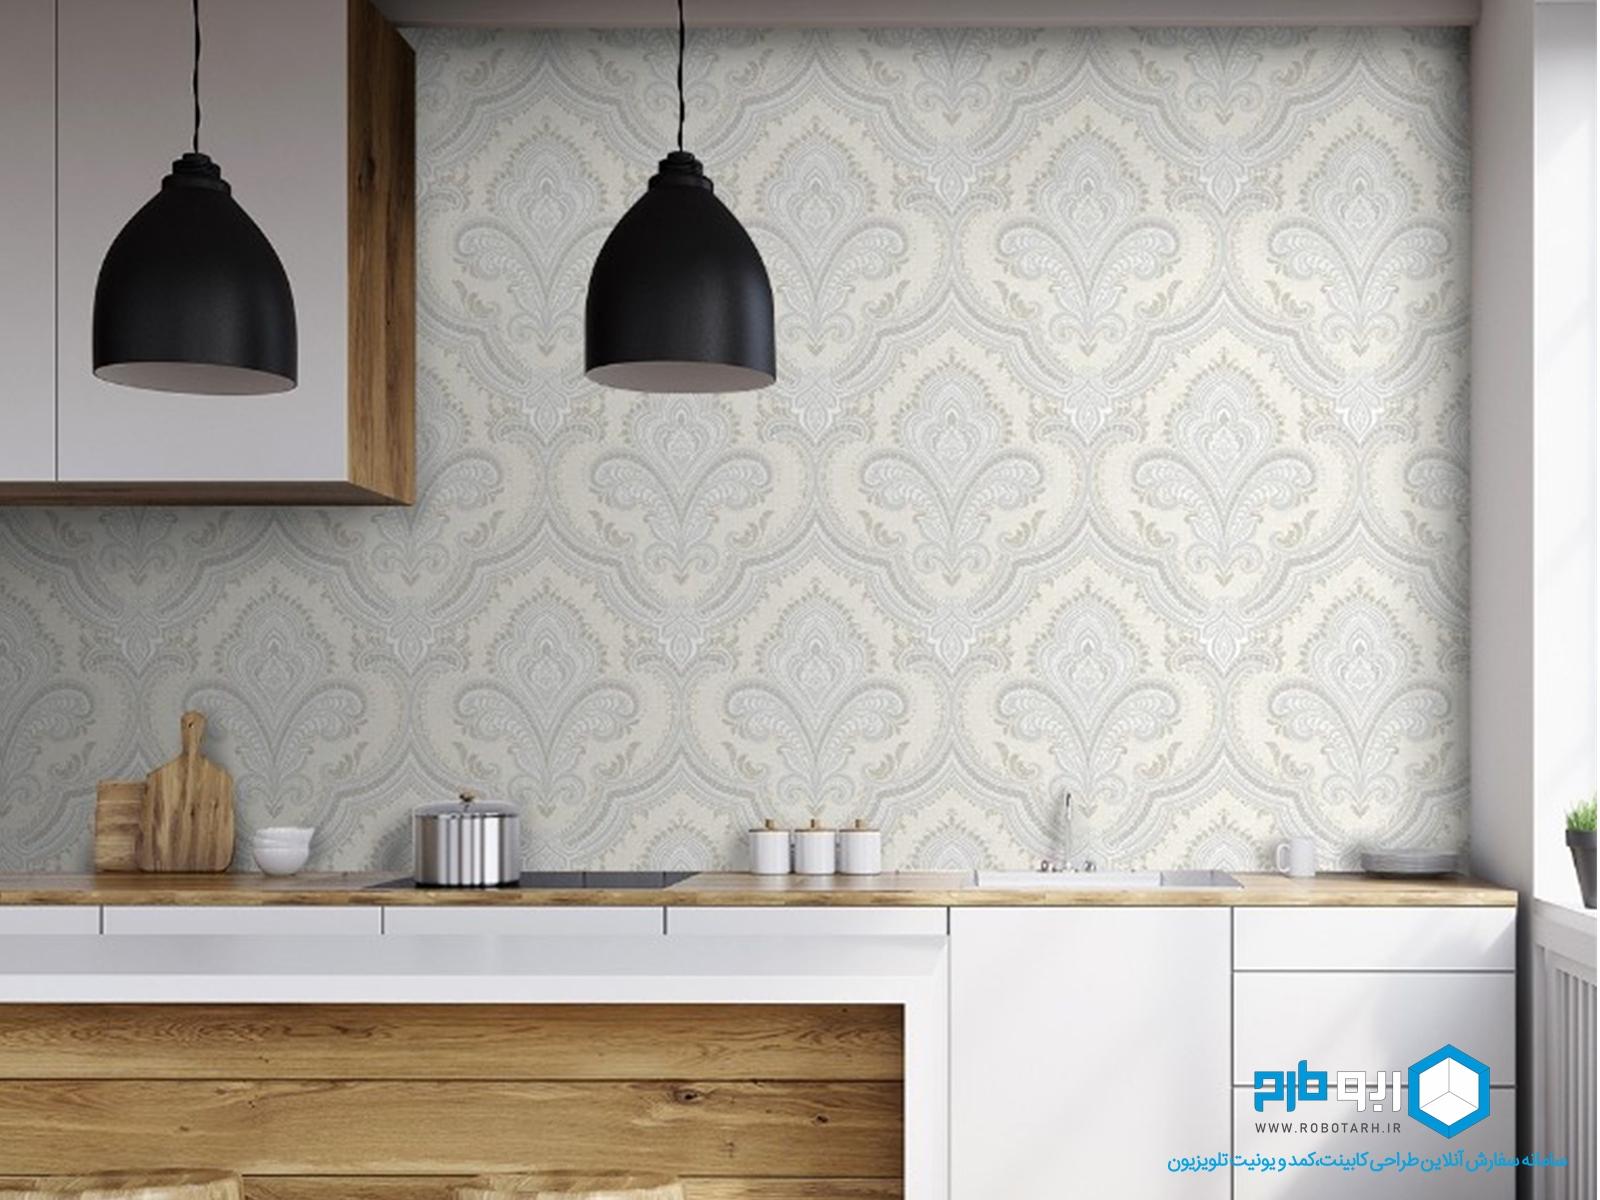 کاغذ دیواری آشپزخانه